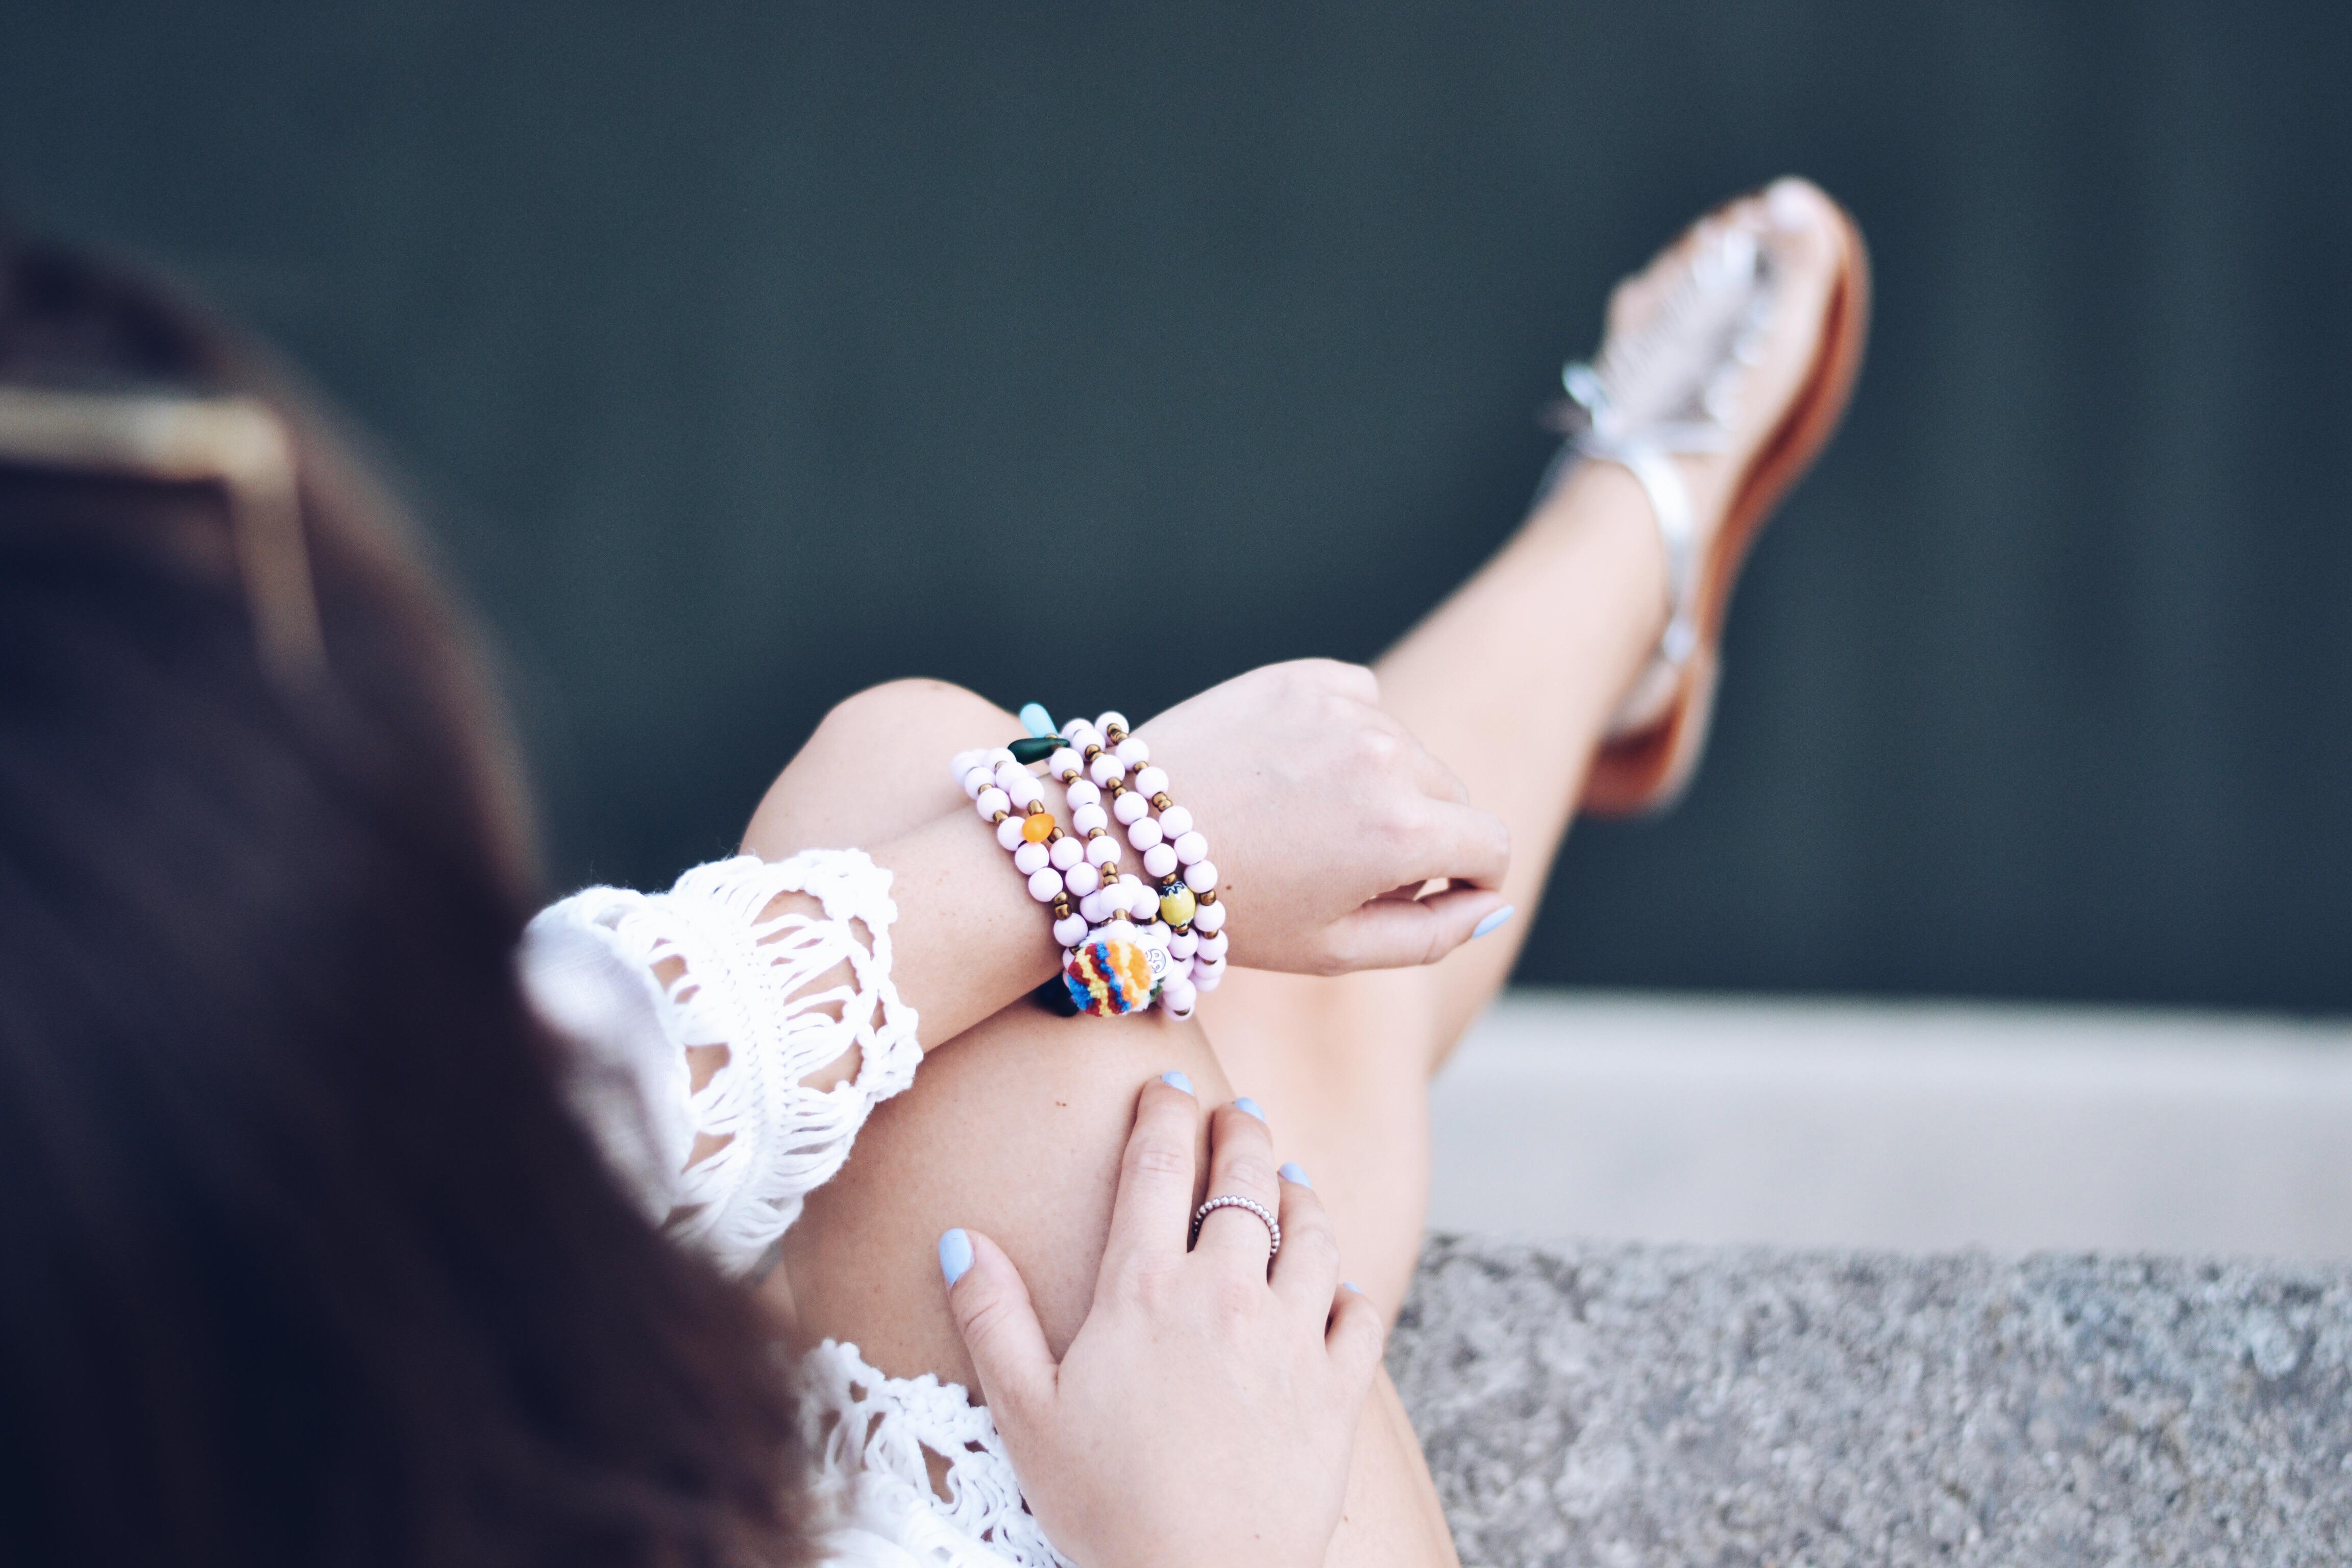 allthatchoices brunette hippie boho look ouitfit inspo inspiration fashionblog fashion fashionblogger tunika häkel spitze jeansshort weiße bluse sommer ibiza ray ban round metal rosa gold rose boyfriendshorts ripped jeans